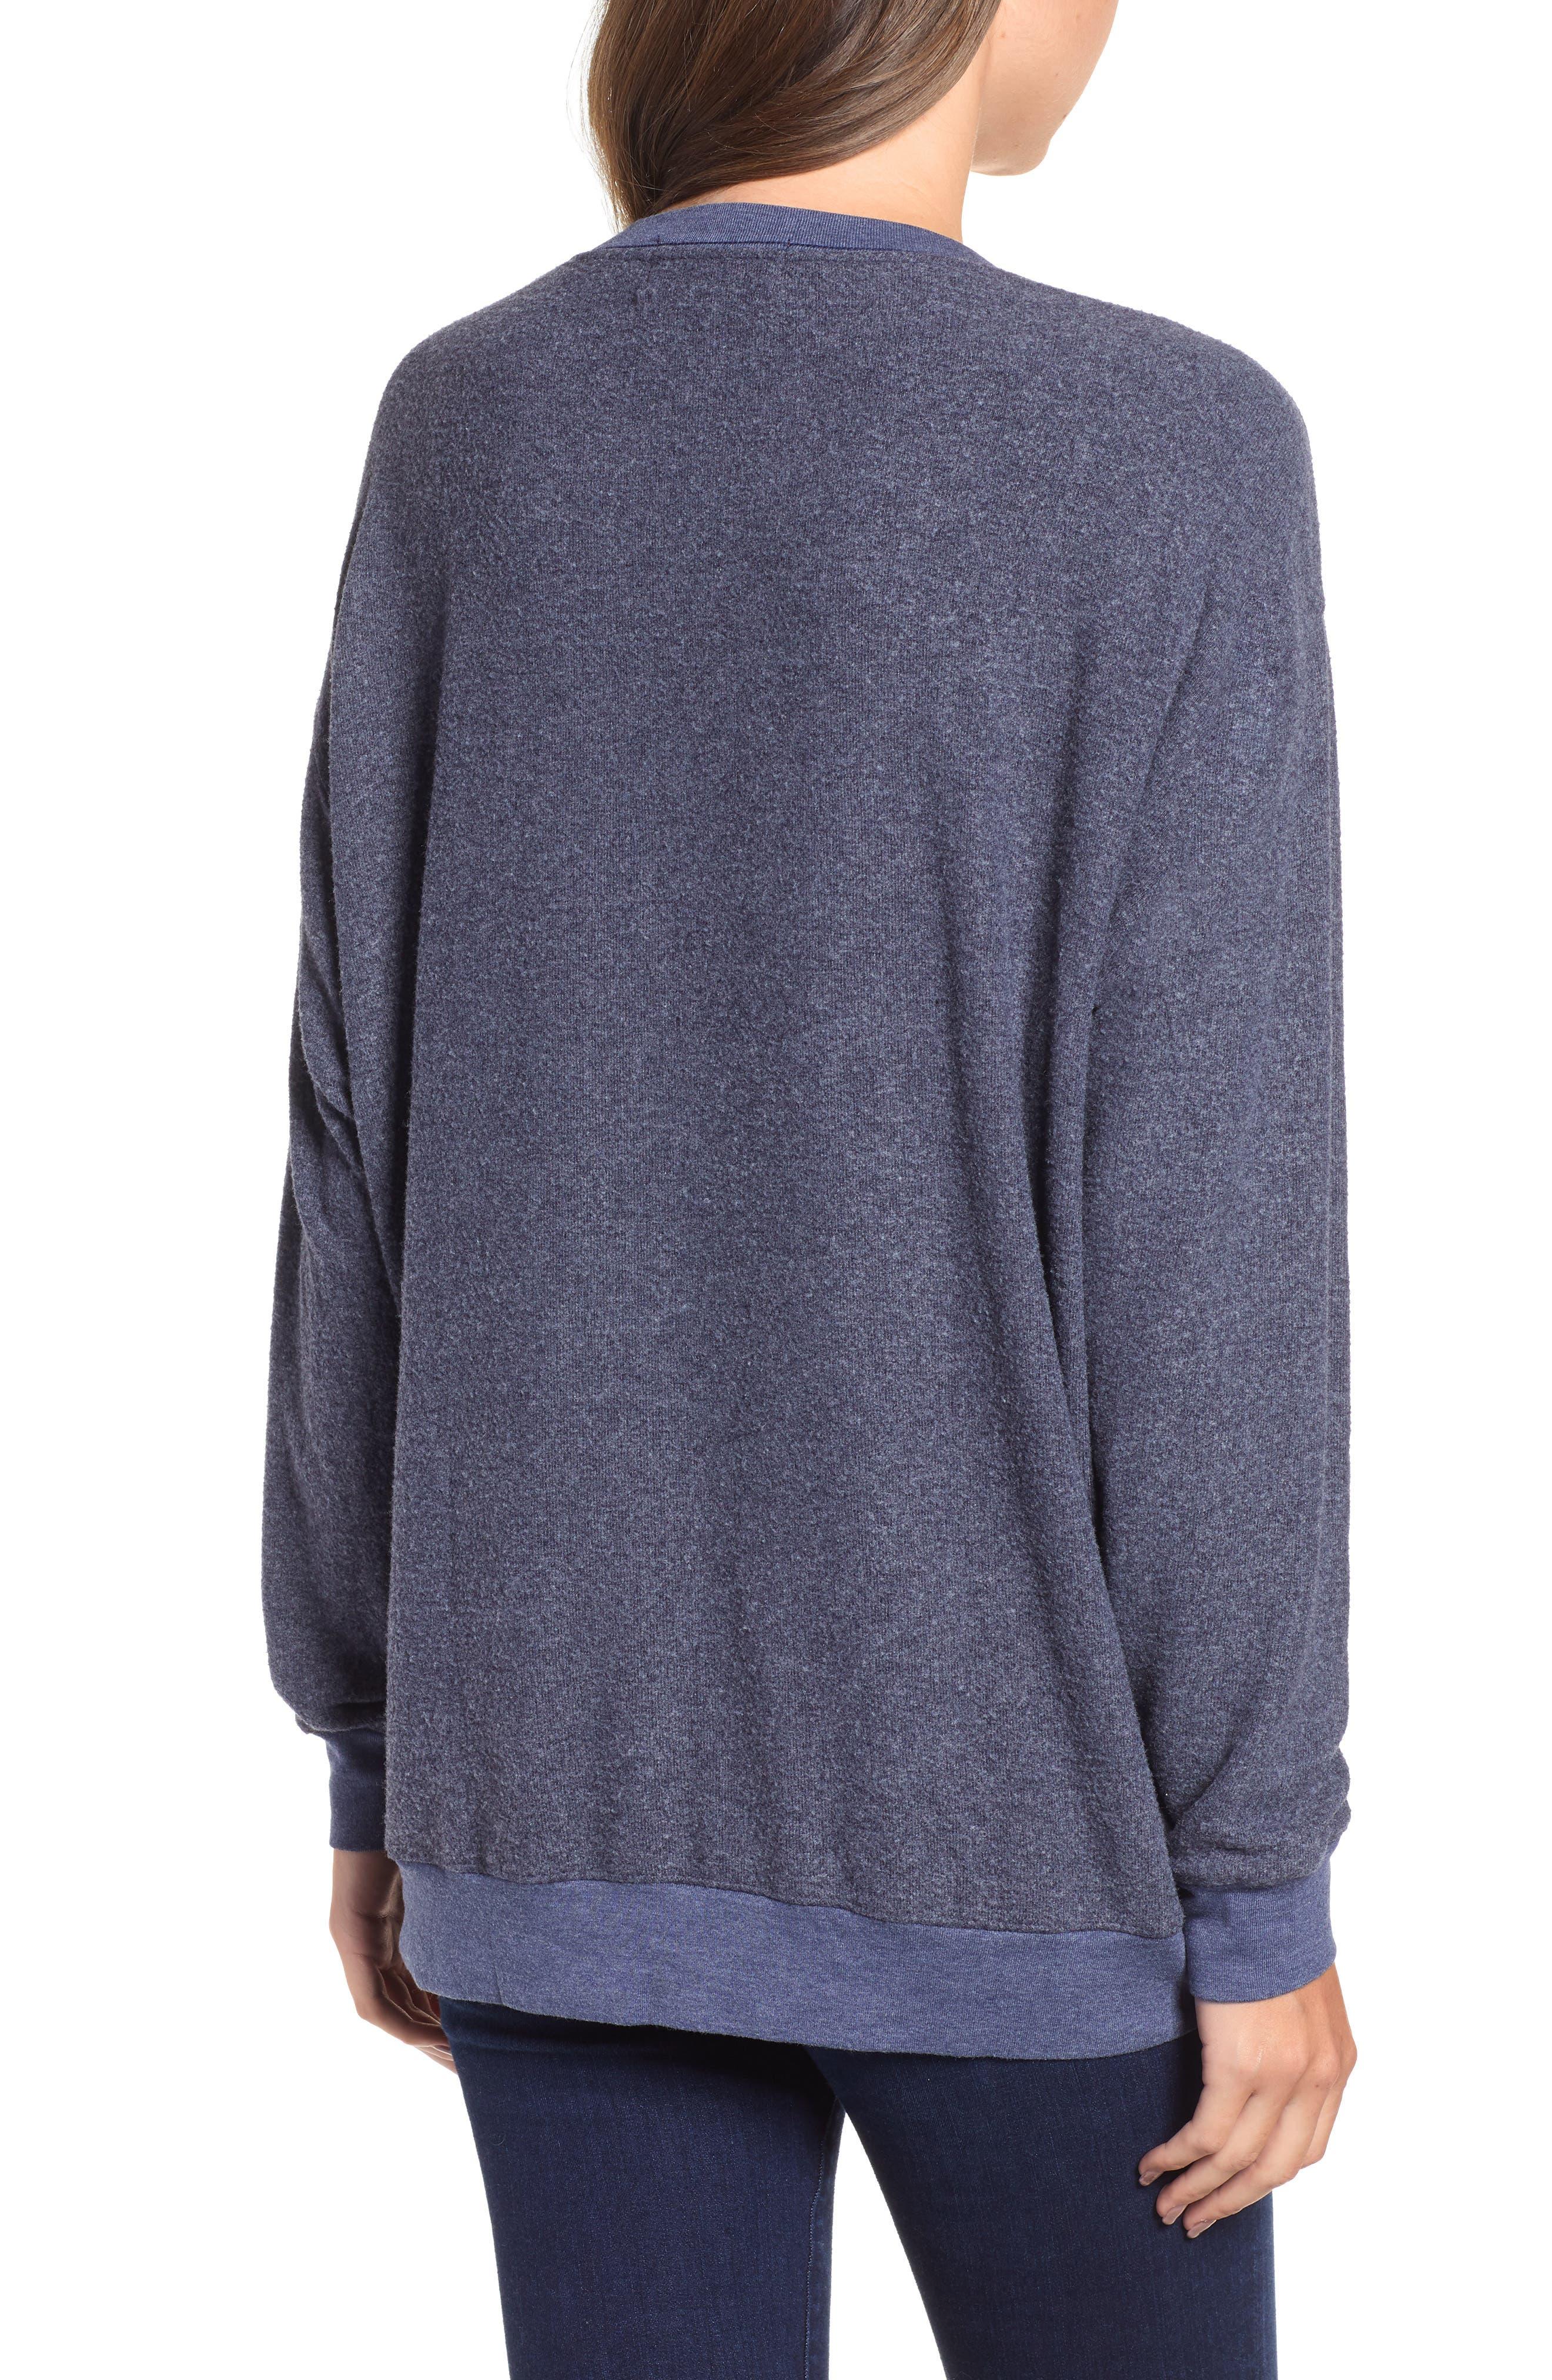 Roadtrip - New York's Finest Pullover,                             Alternate thumbnail 2, color,                             OXFORD